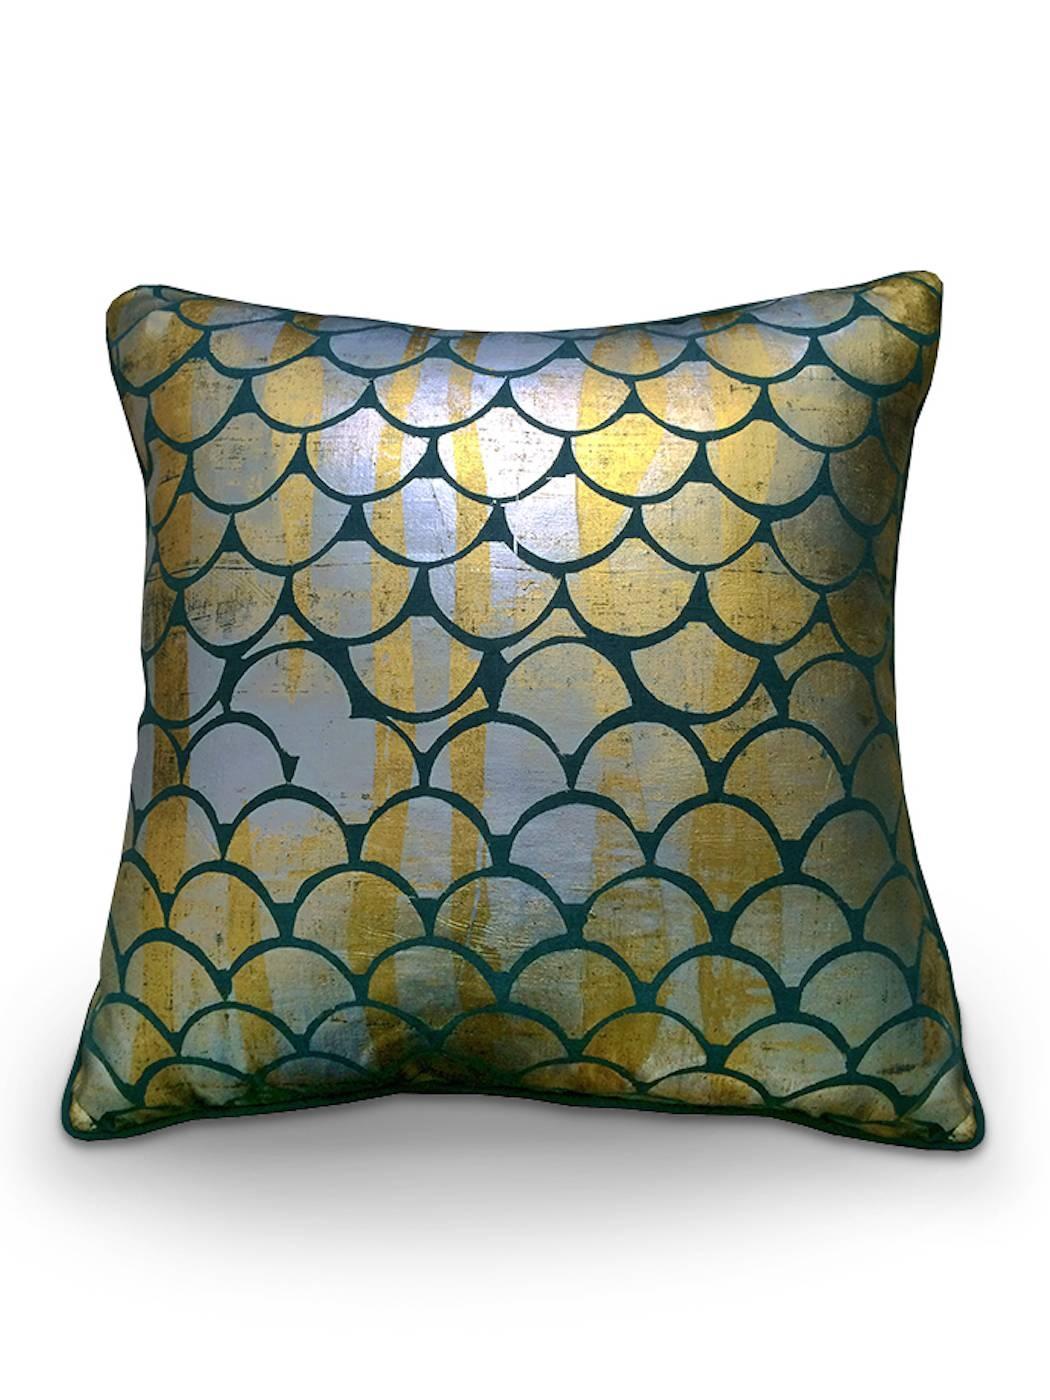 Silver And Gold Mermaid Sofa Cushion Covers | Wright & Smith inside Sofa Cushion Covers (Image 14 of 15)